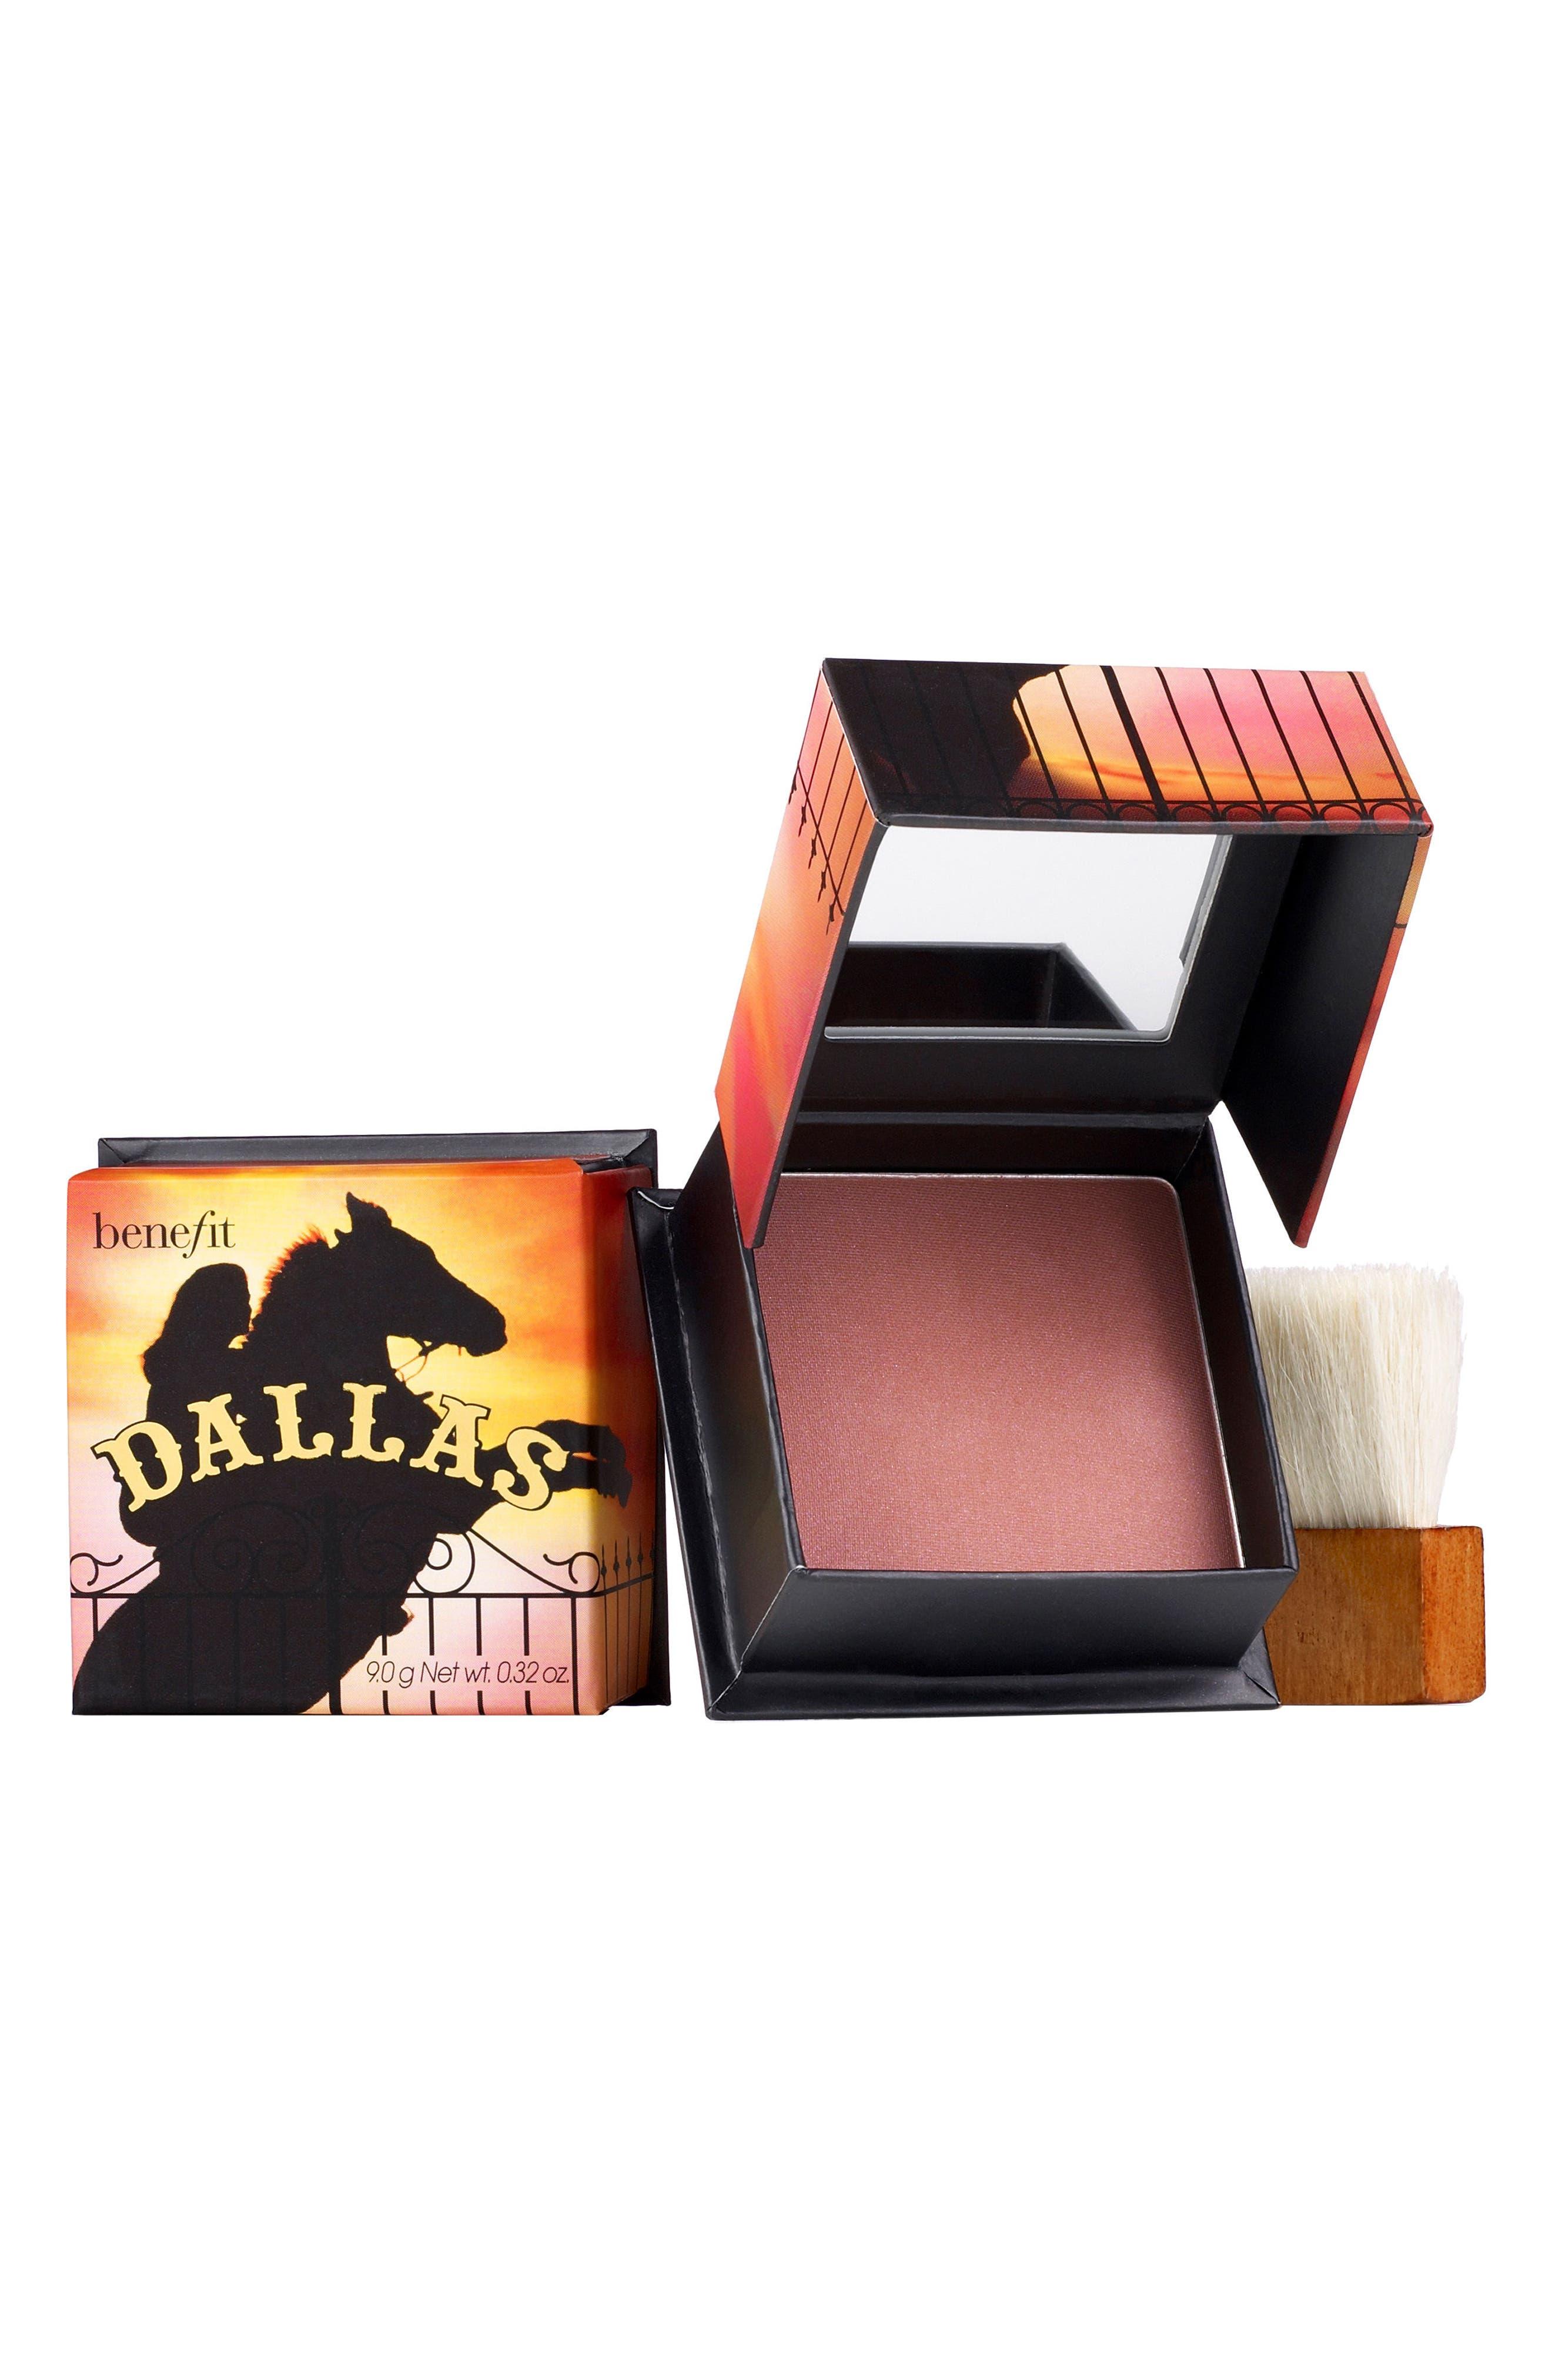 Benefit Dallas Dusty Rose Powder Blush,                             Main thumbnail 1, color,                             DUSTY ROSE